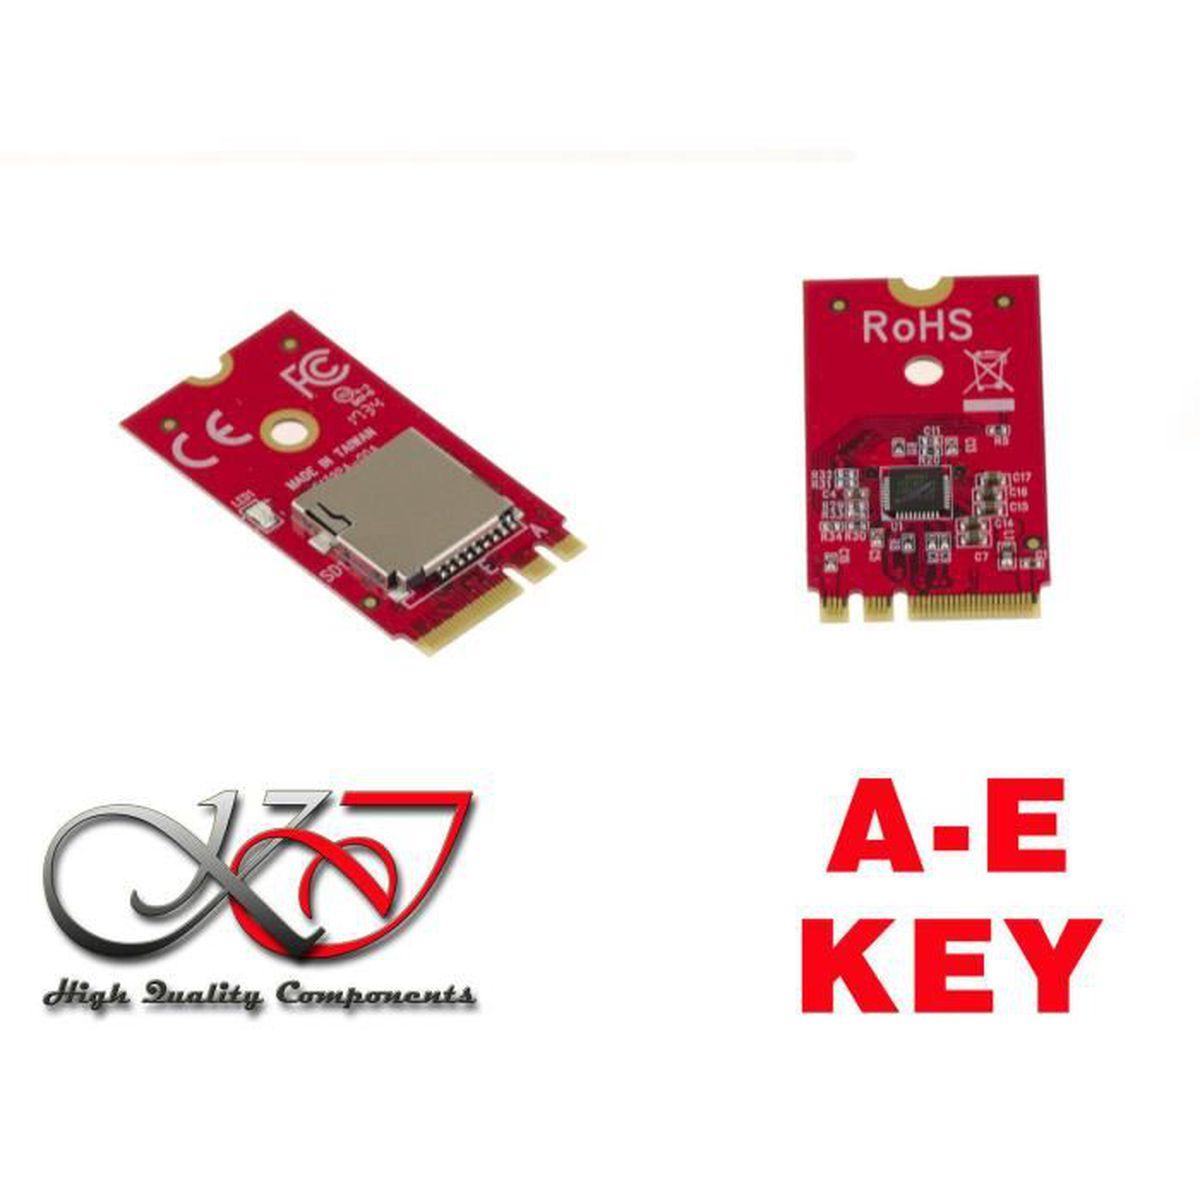 Support UHS-I Cartes TF//Micro SD//Micro SDXC//SDHC Micro//Mini SD SDHC//MMC Rocketek Mini USB 3.0 Lecteur de Carte m/émoire//Writer avec 3 emplacements pour Carte SD//SDXC